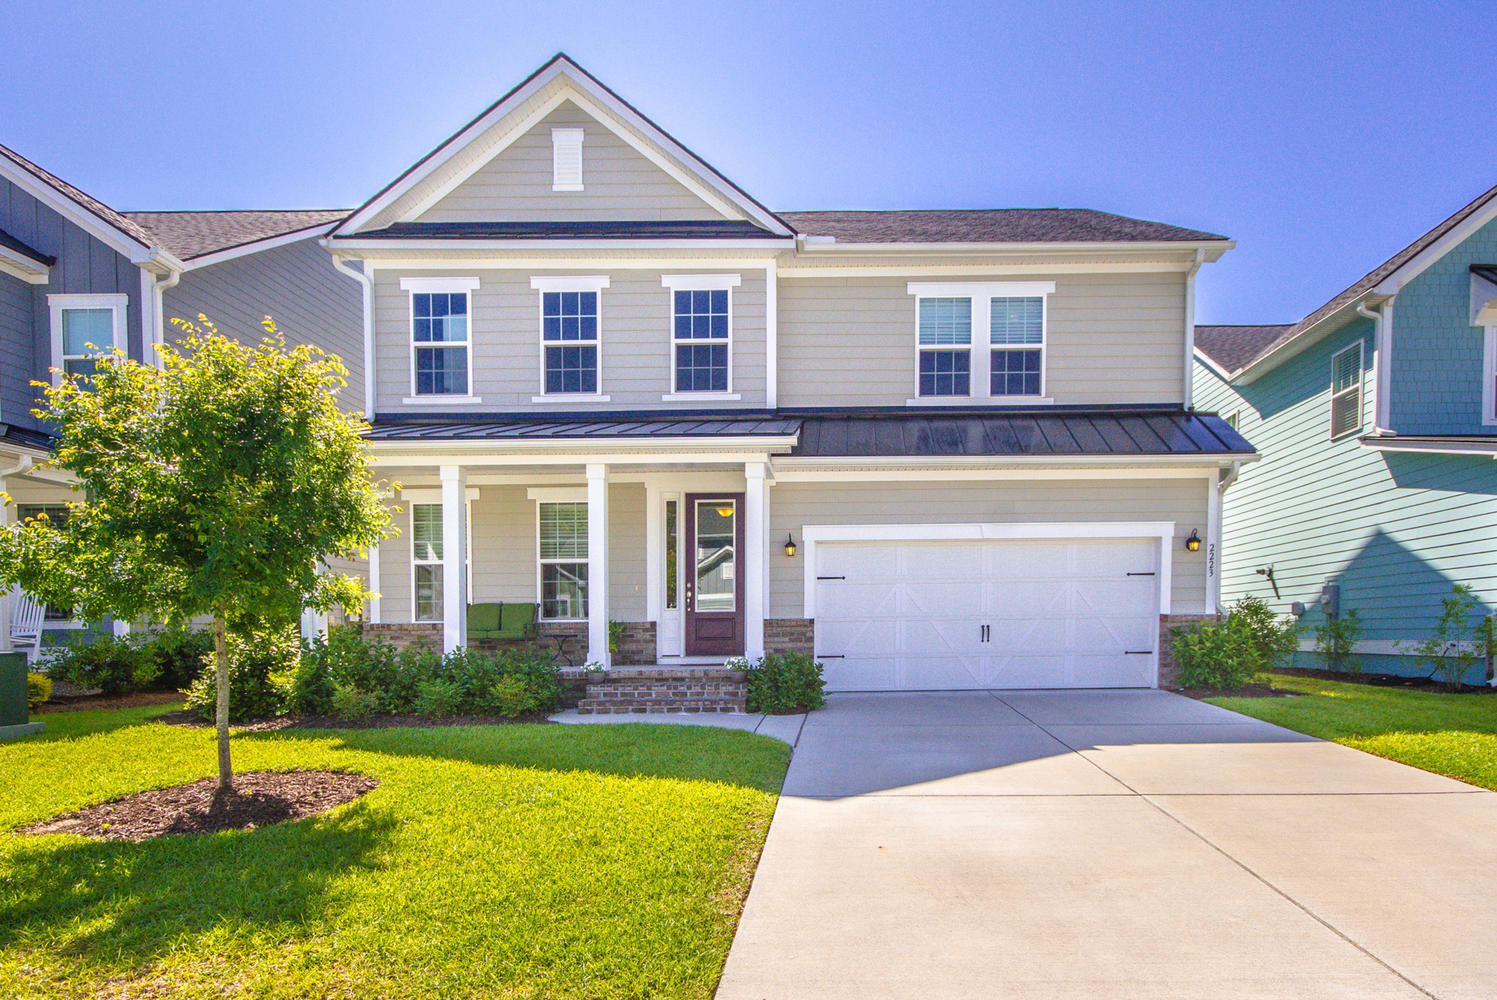 Magnolia Village Homes For Sale - 2223 Spring Hope, Mount Pleasant, SC - 37